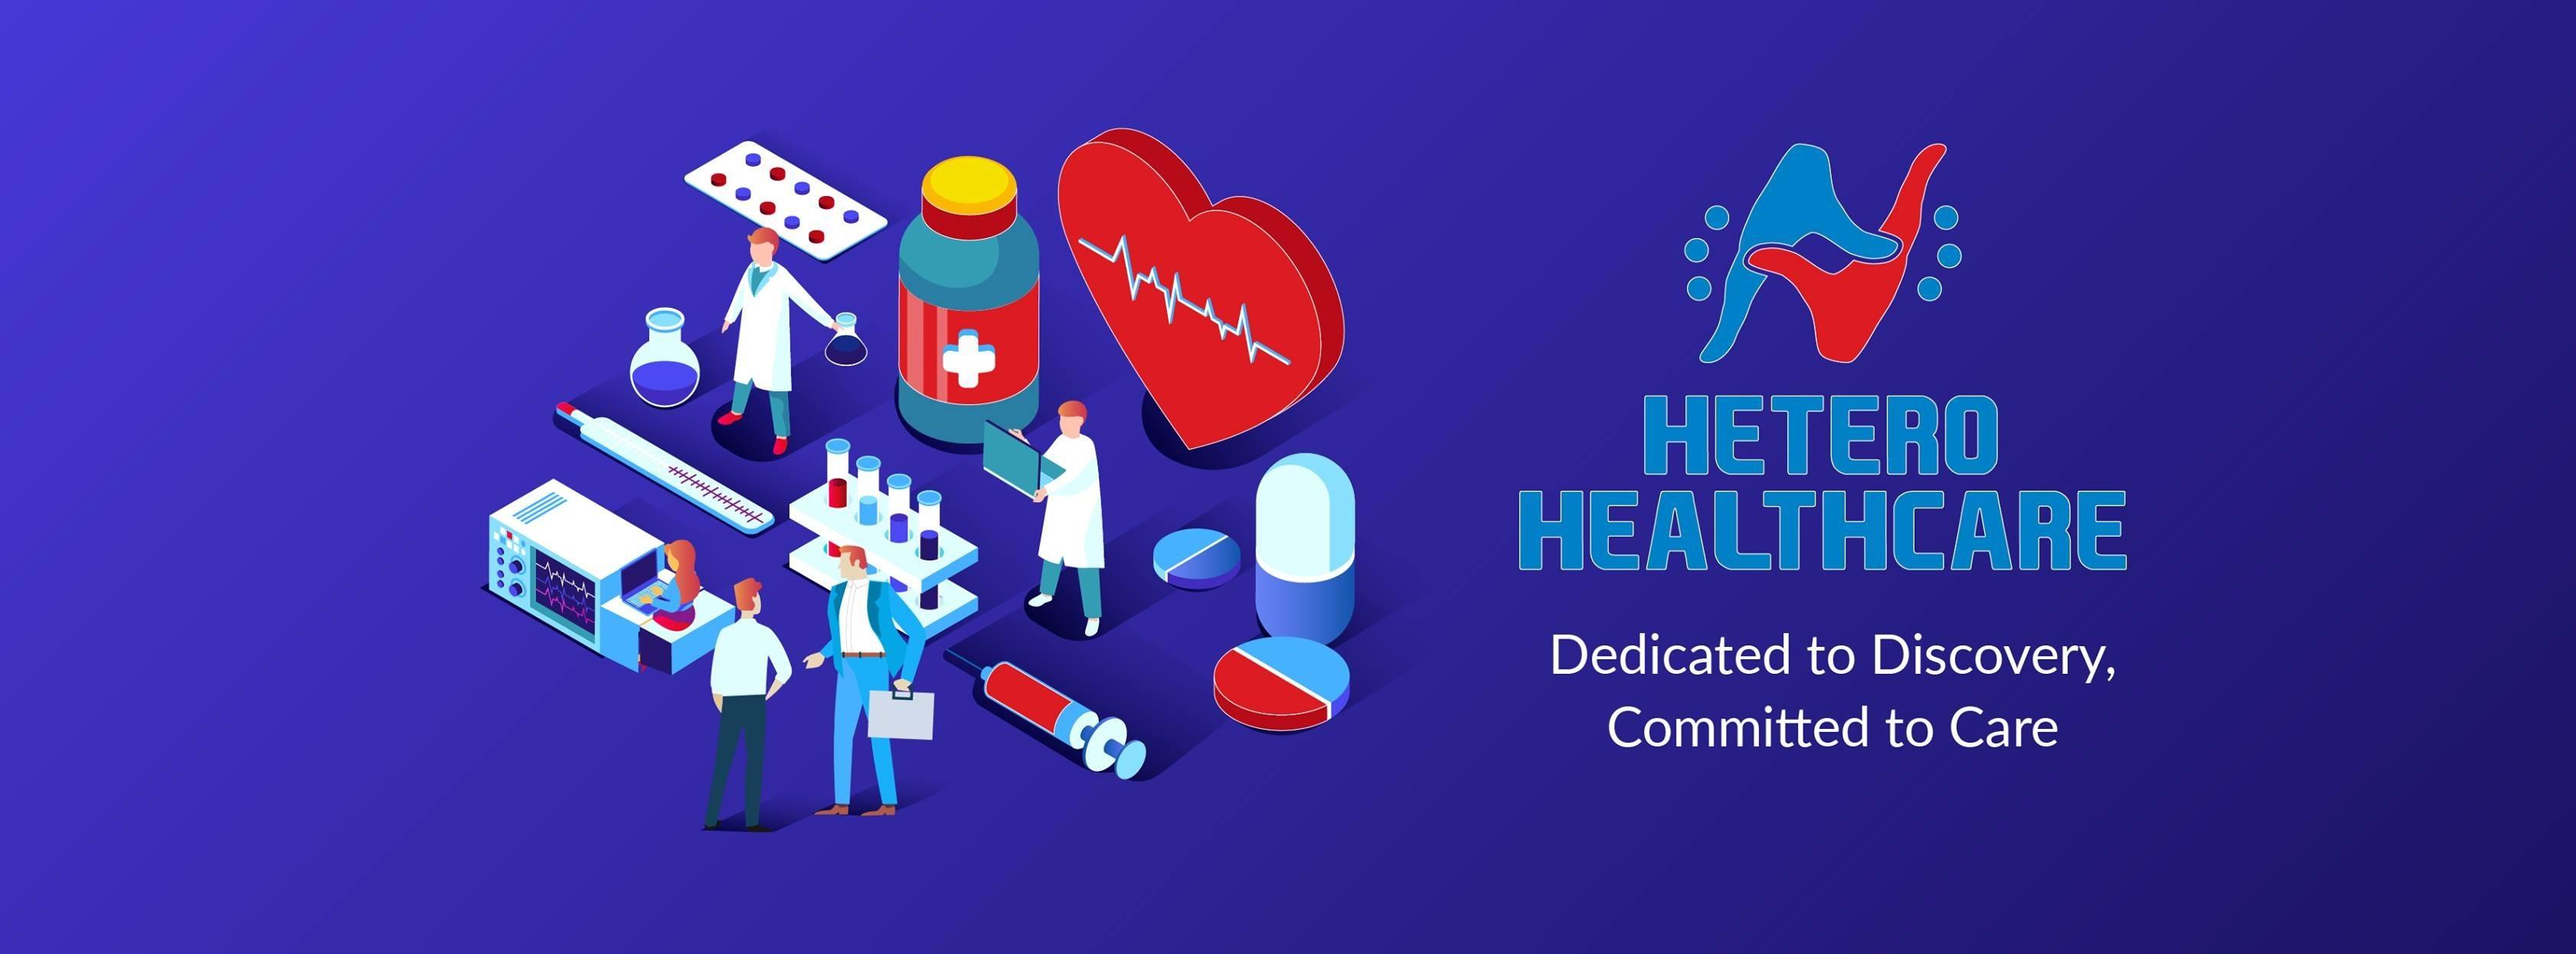 HETERO HEALTHCARE LIMITED | LinkedIn